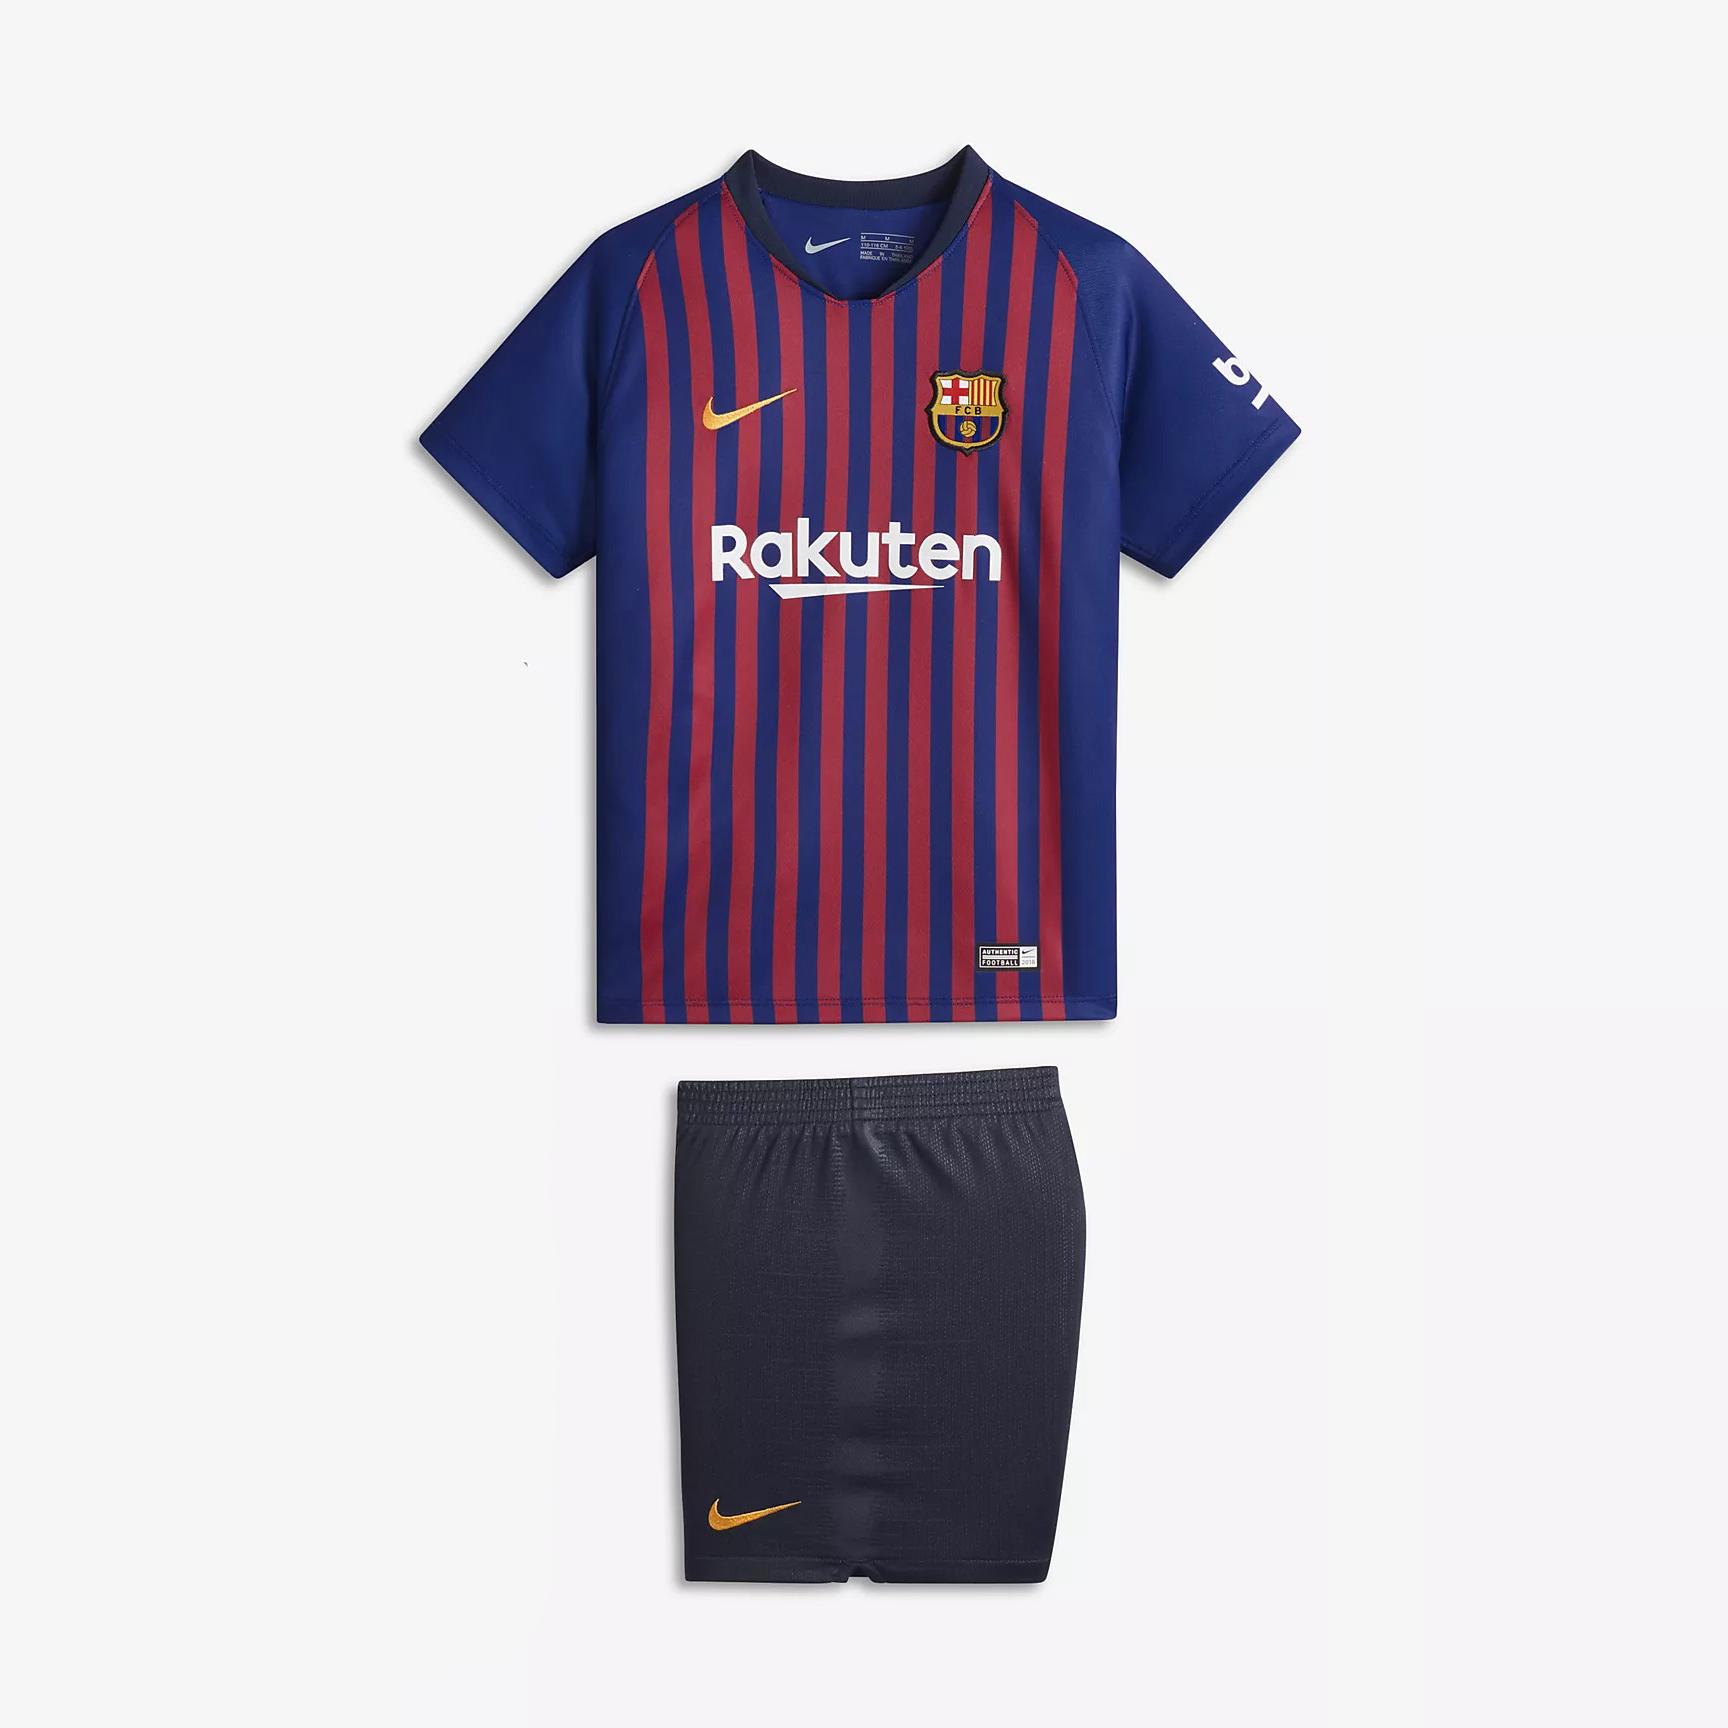 quality design 627b2 659e5 barcelona kids jersey